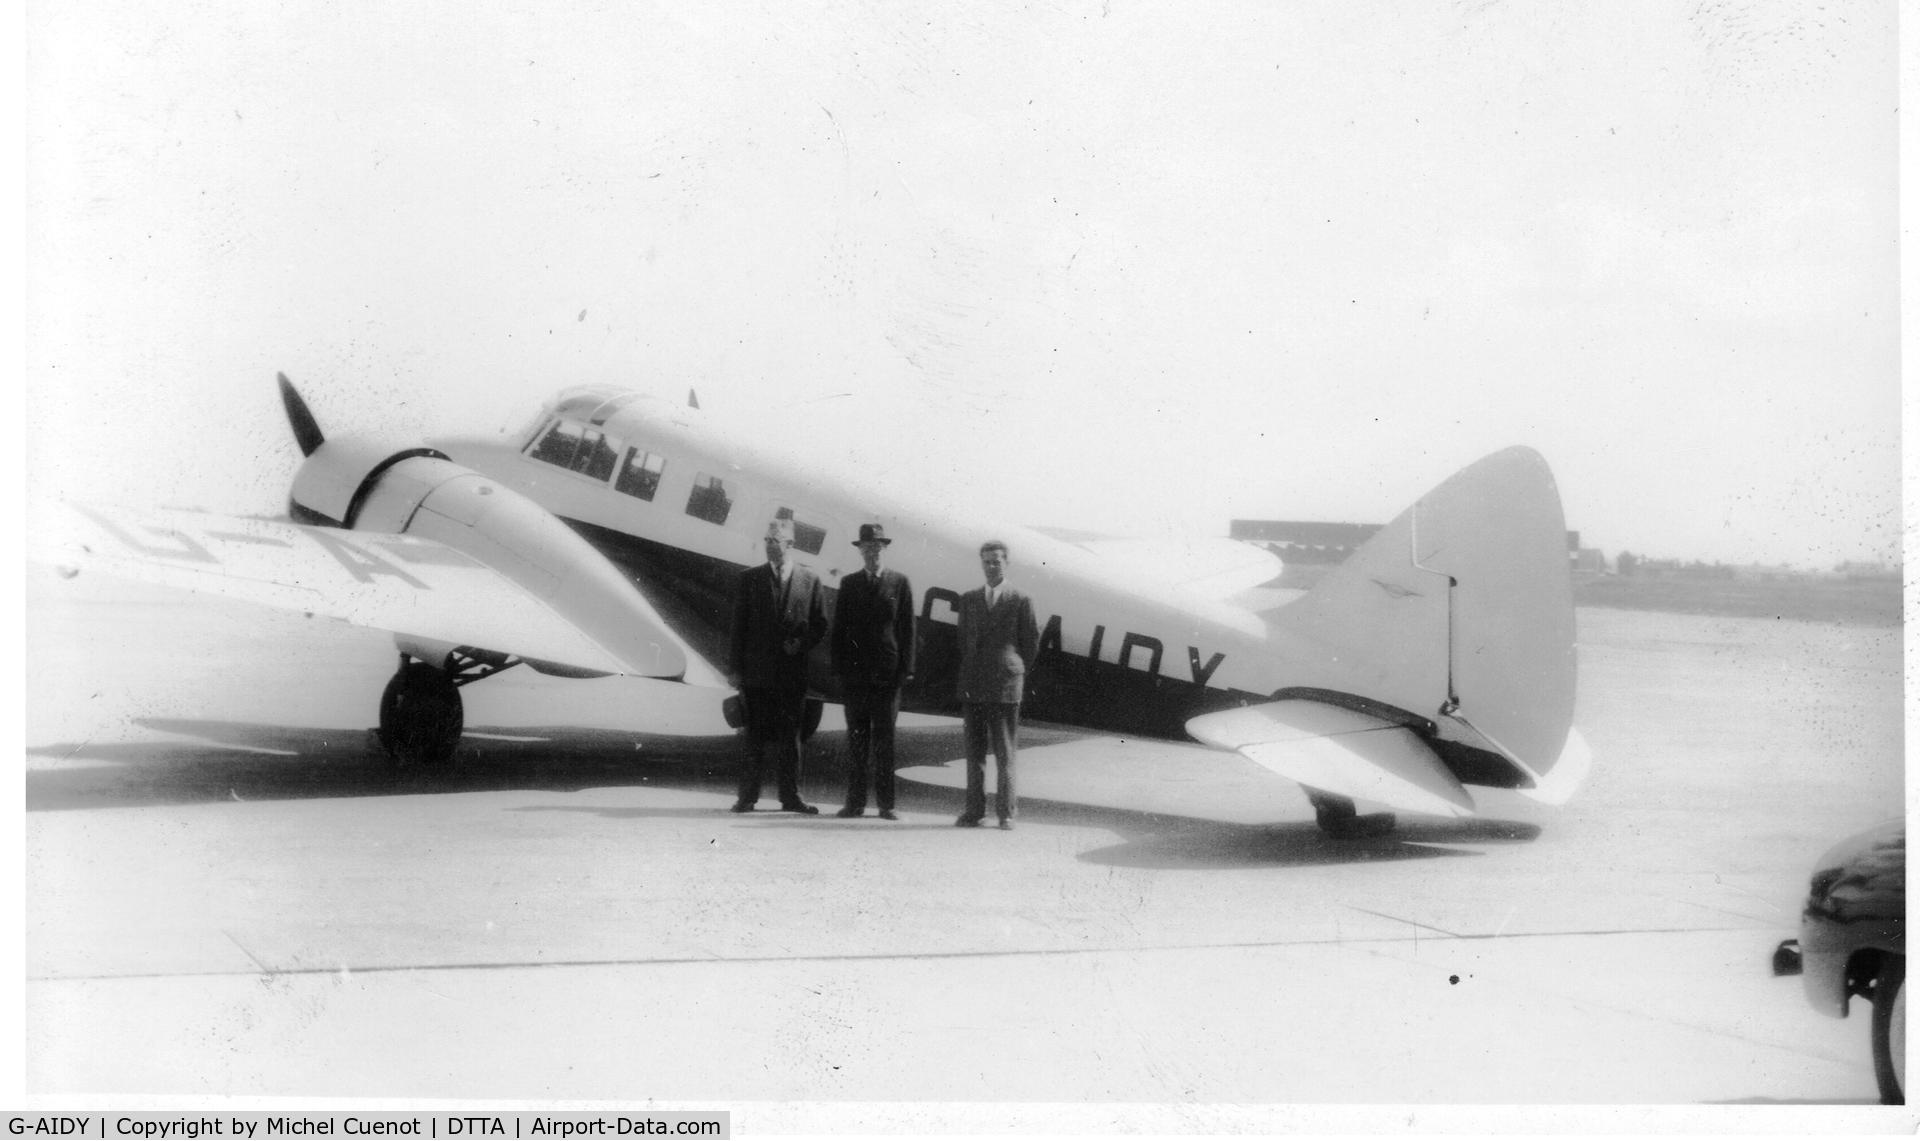 G-AIDY, Airspeed AS.65 Consul C/N 3094, Airspeed cONSUL